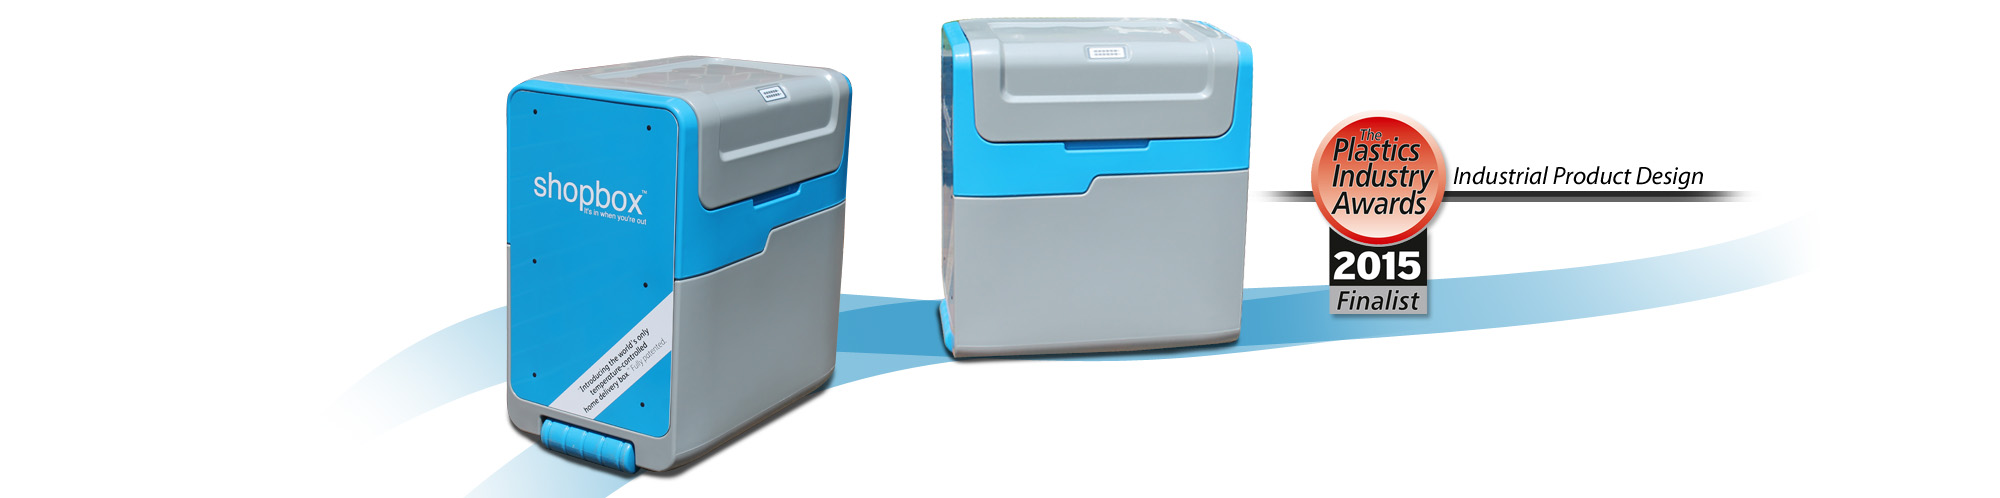 Home-Page-Slider-ShopBox-21